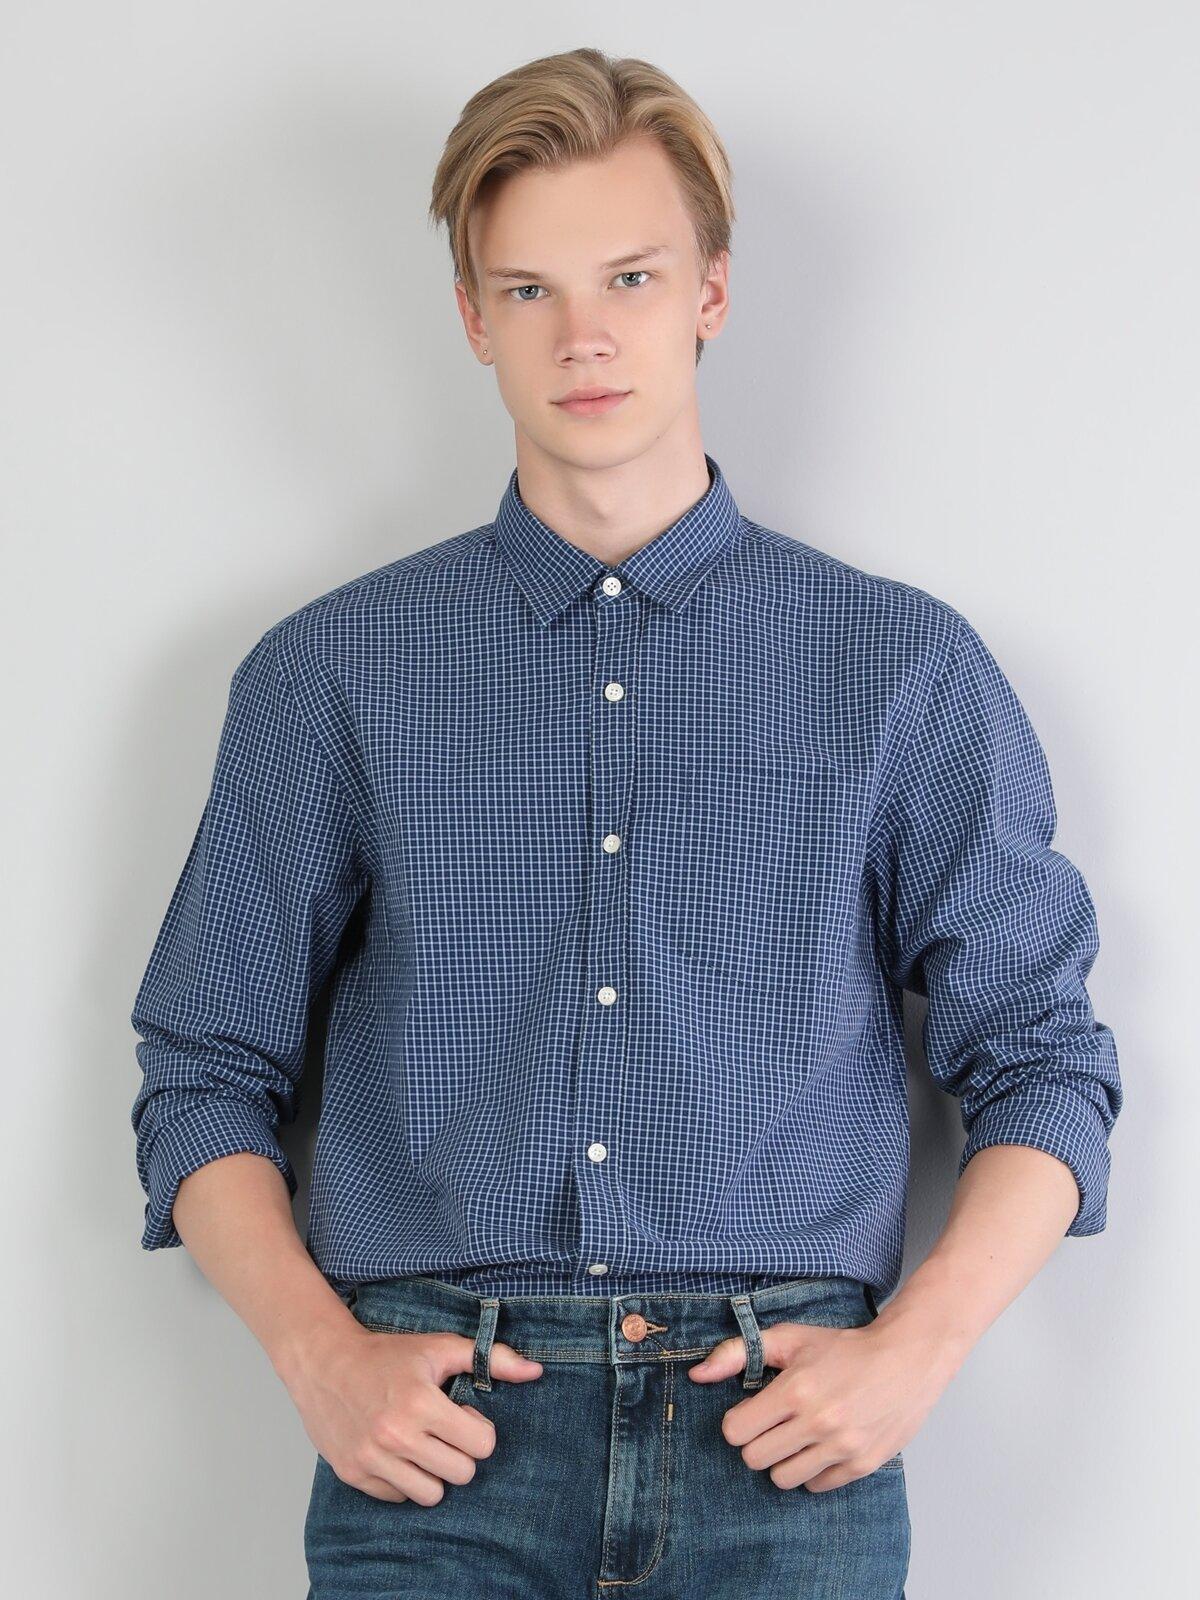 Regular Fit Shirt Neck Erkek Koyu Mavi Uzun Kol Gömlek